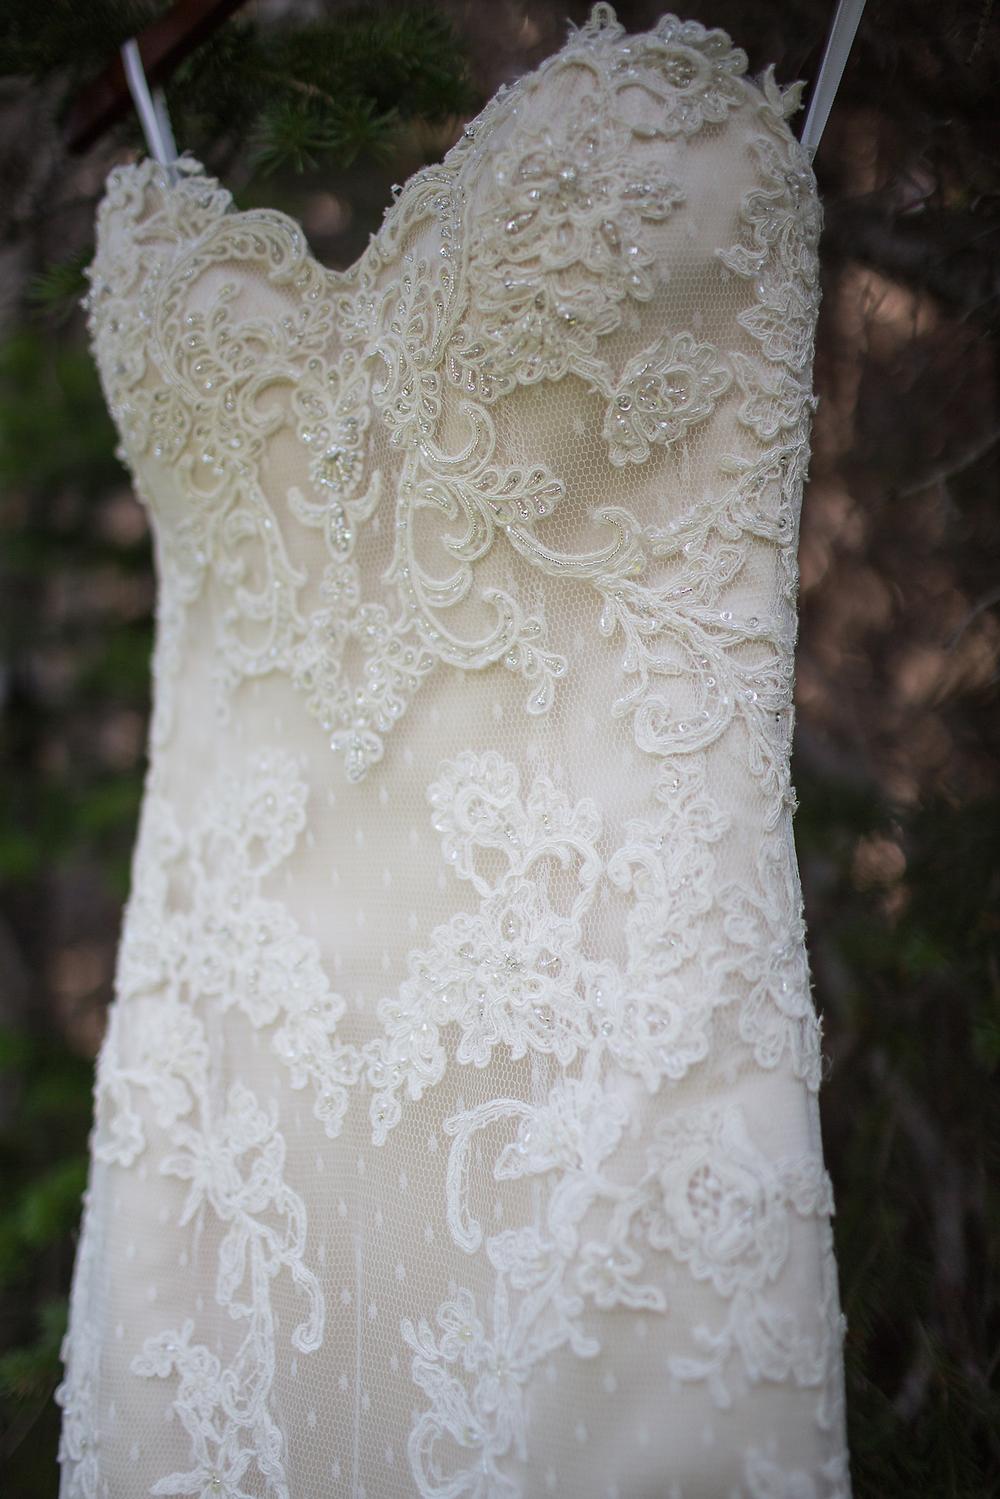 brett-birdsong-photography-082814-wedding-dress.jpg